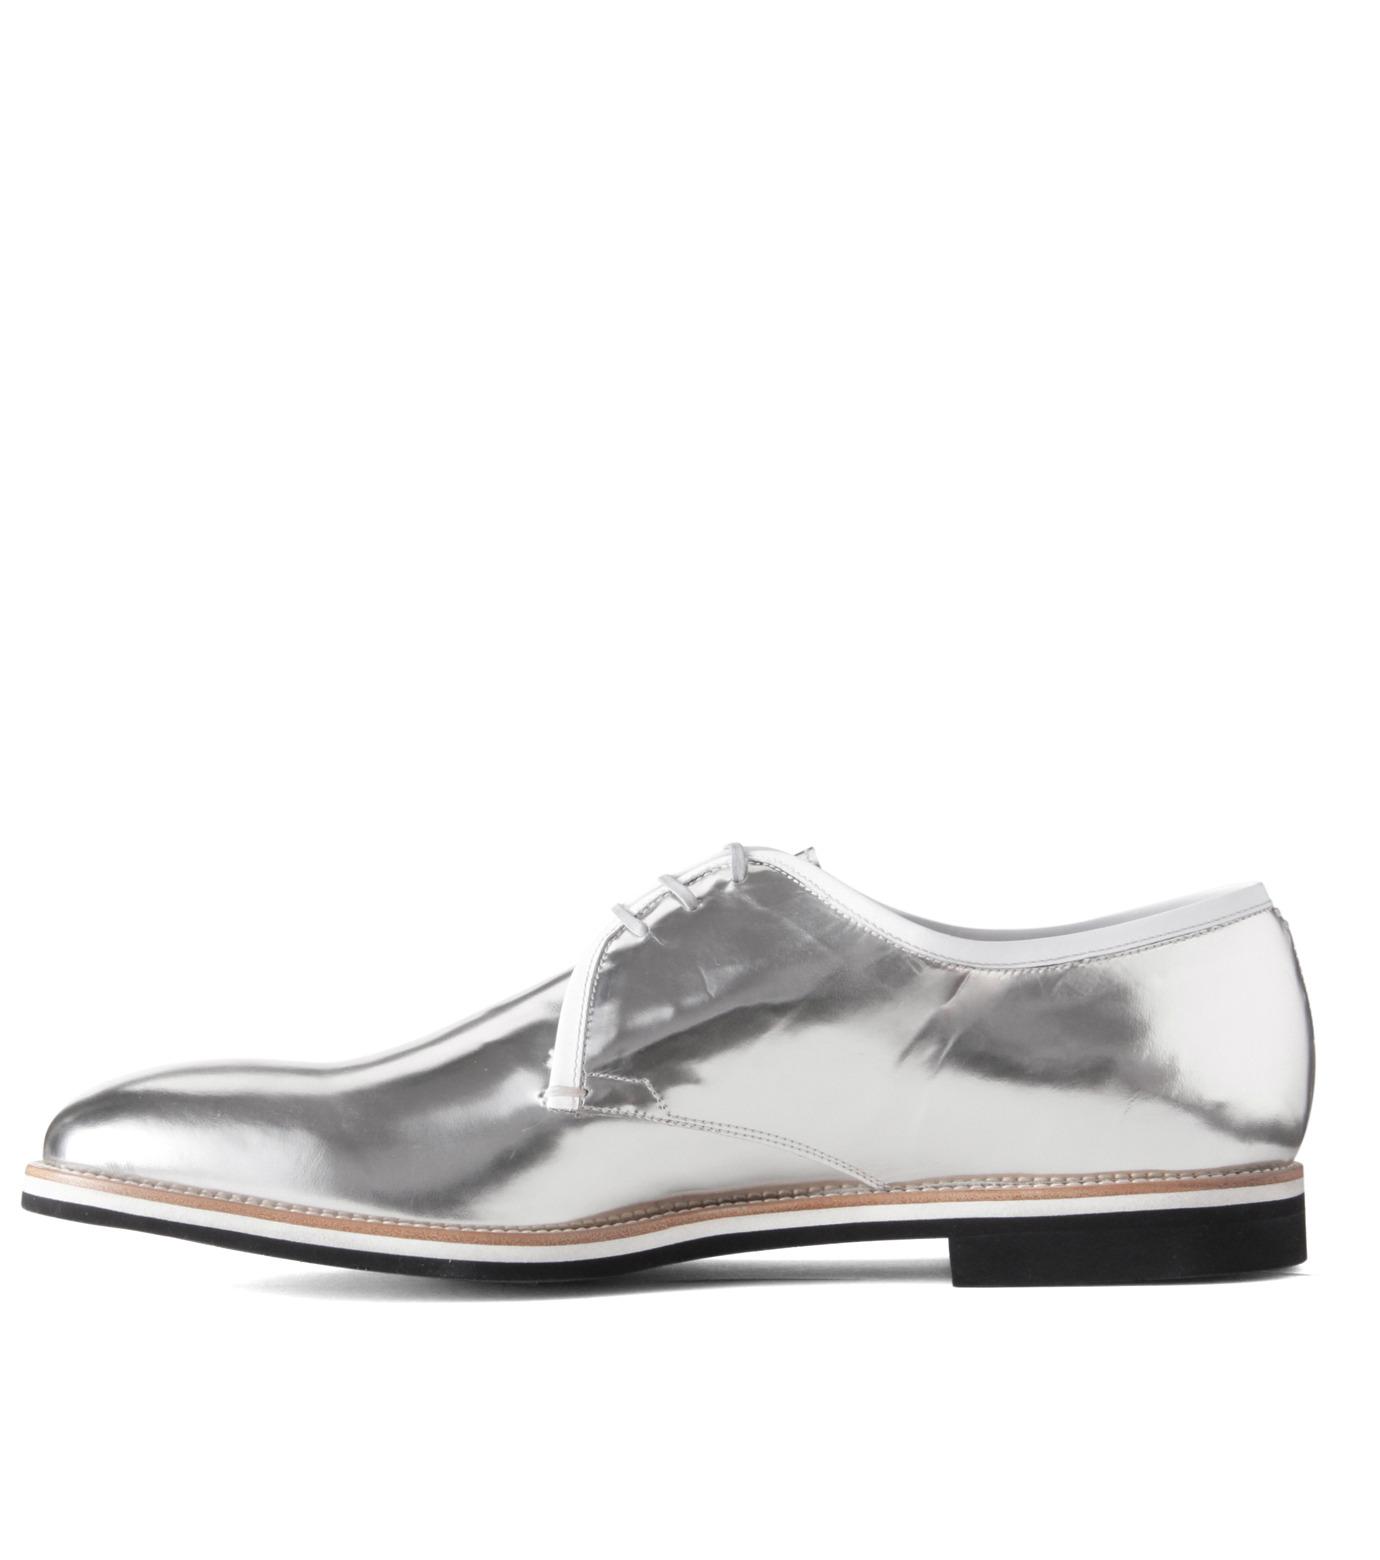 Sergio Rossi(セルジオ ロッシ)のDerby-SILVER(シューズ/shoes)-A61190-1 拡大詳細画像2